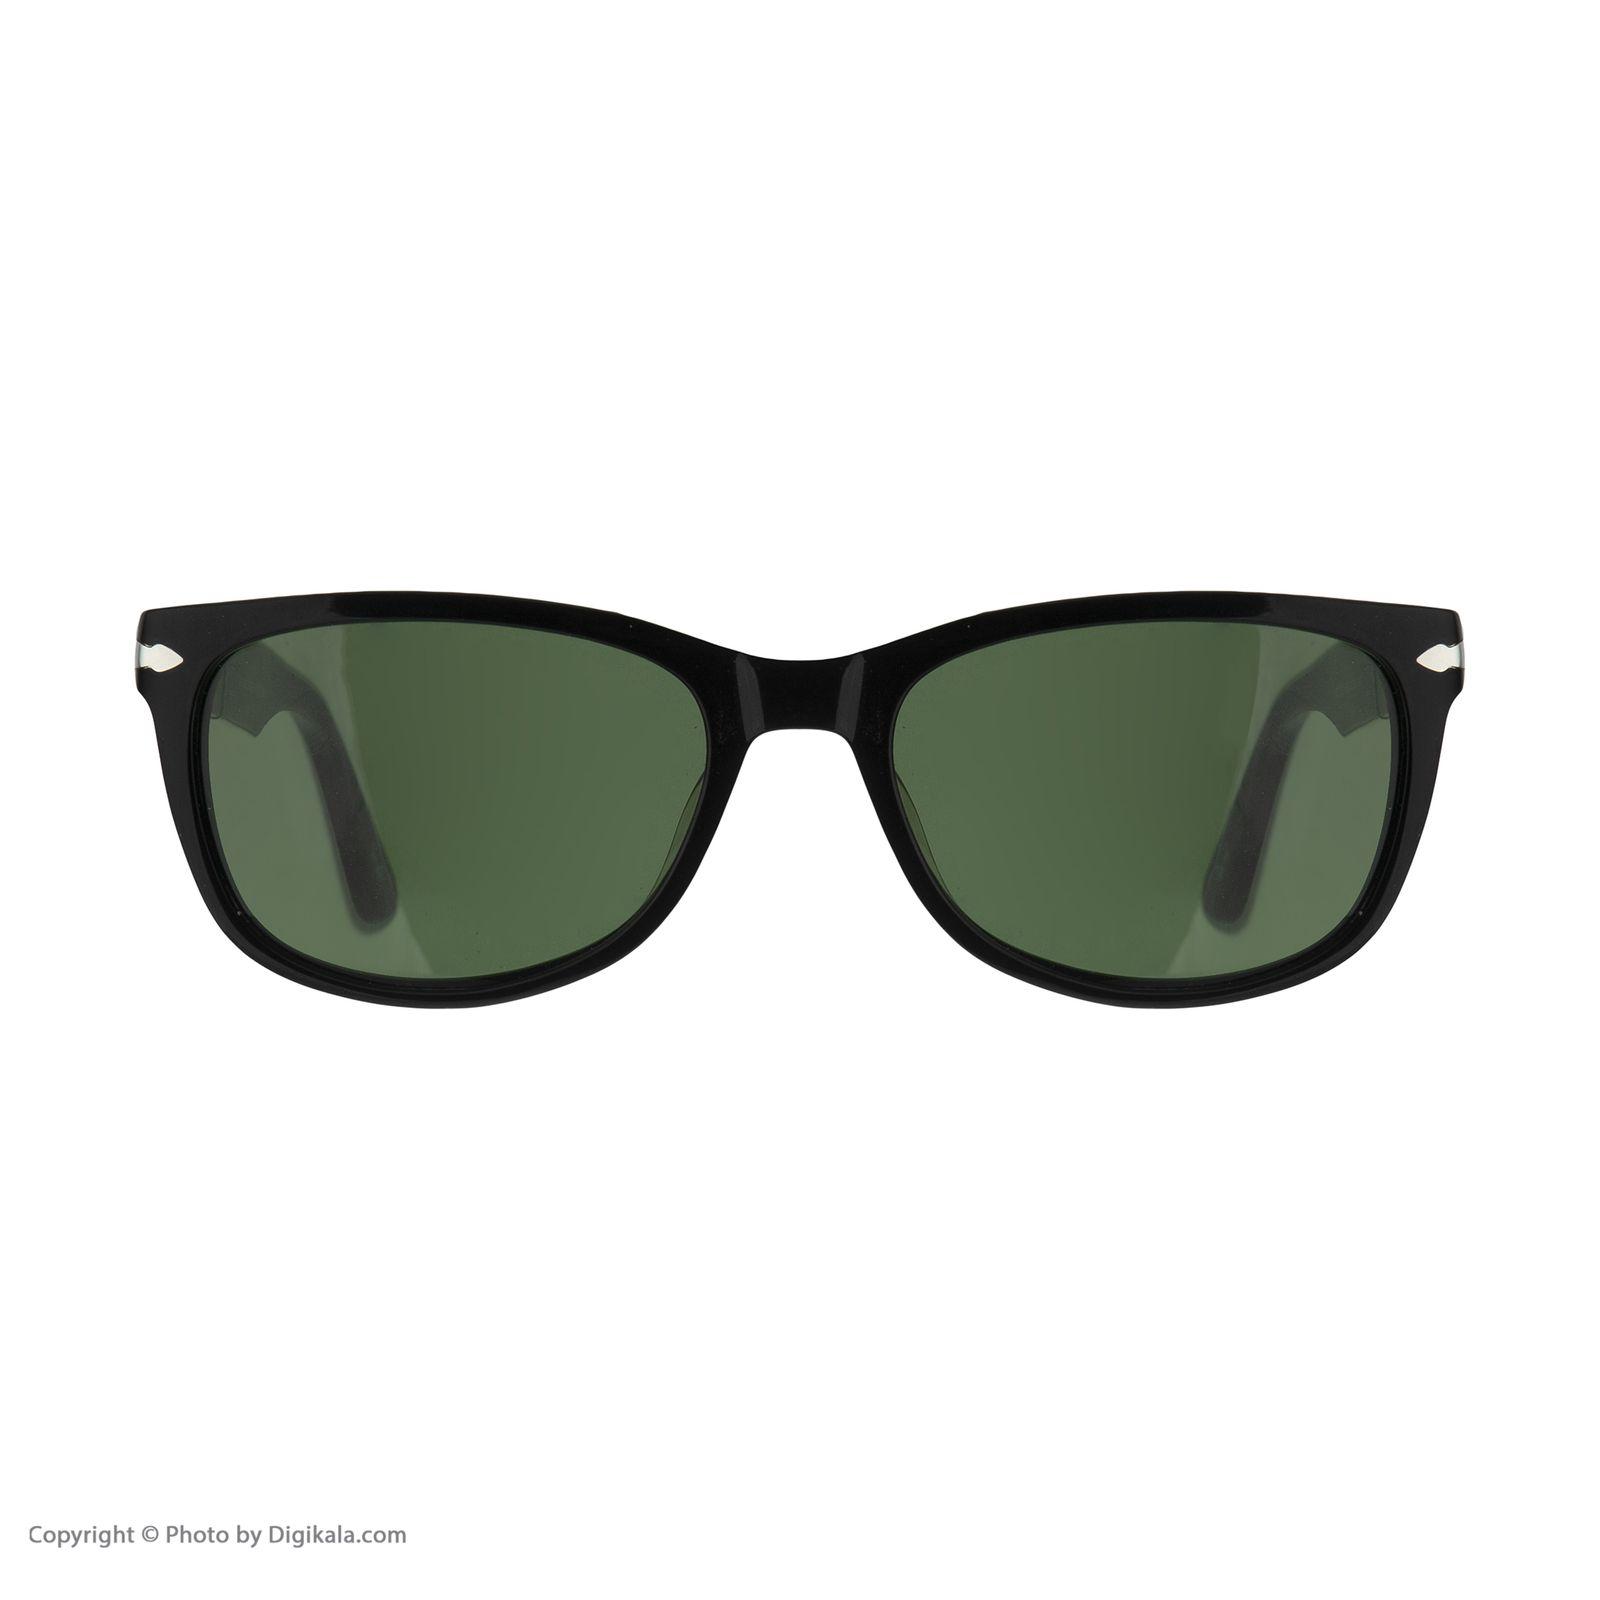 عینک آفتابی پرسول مدل 2953 -  - 6